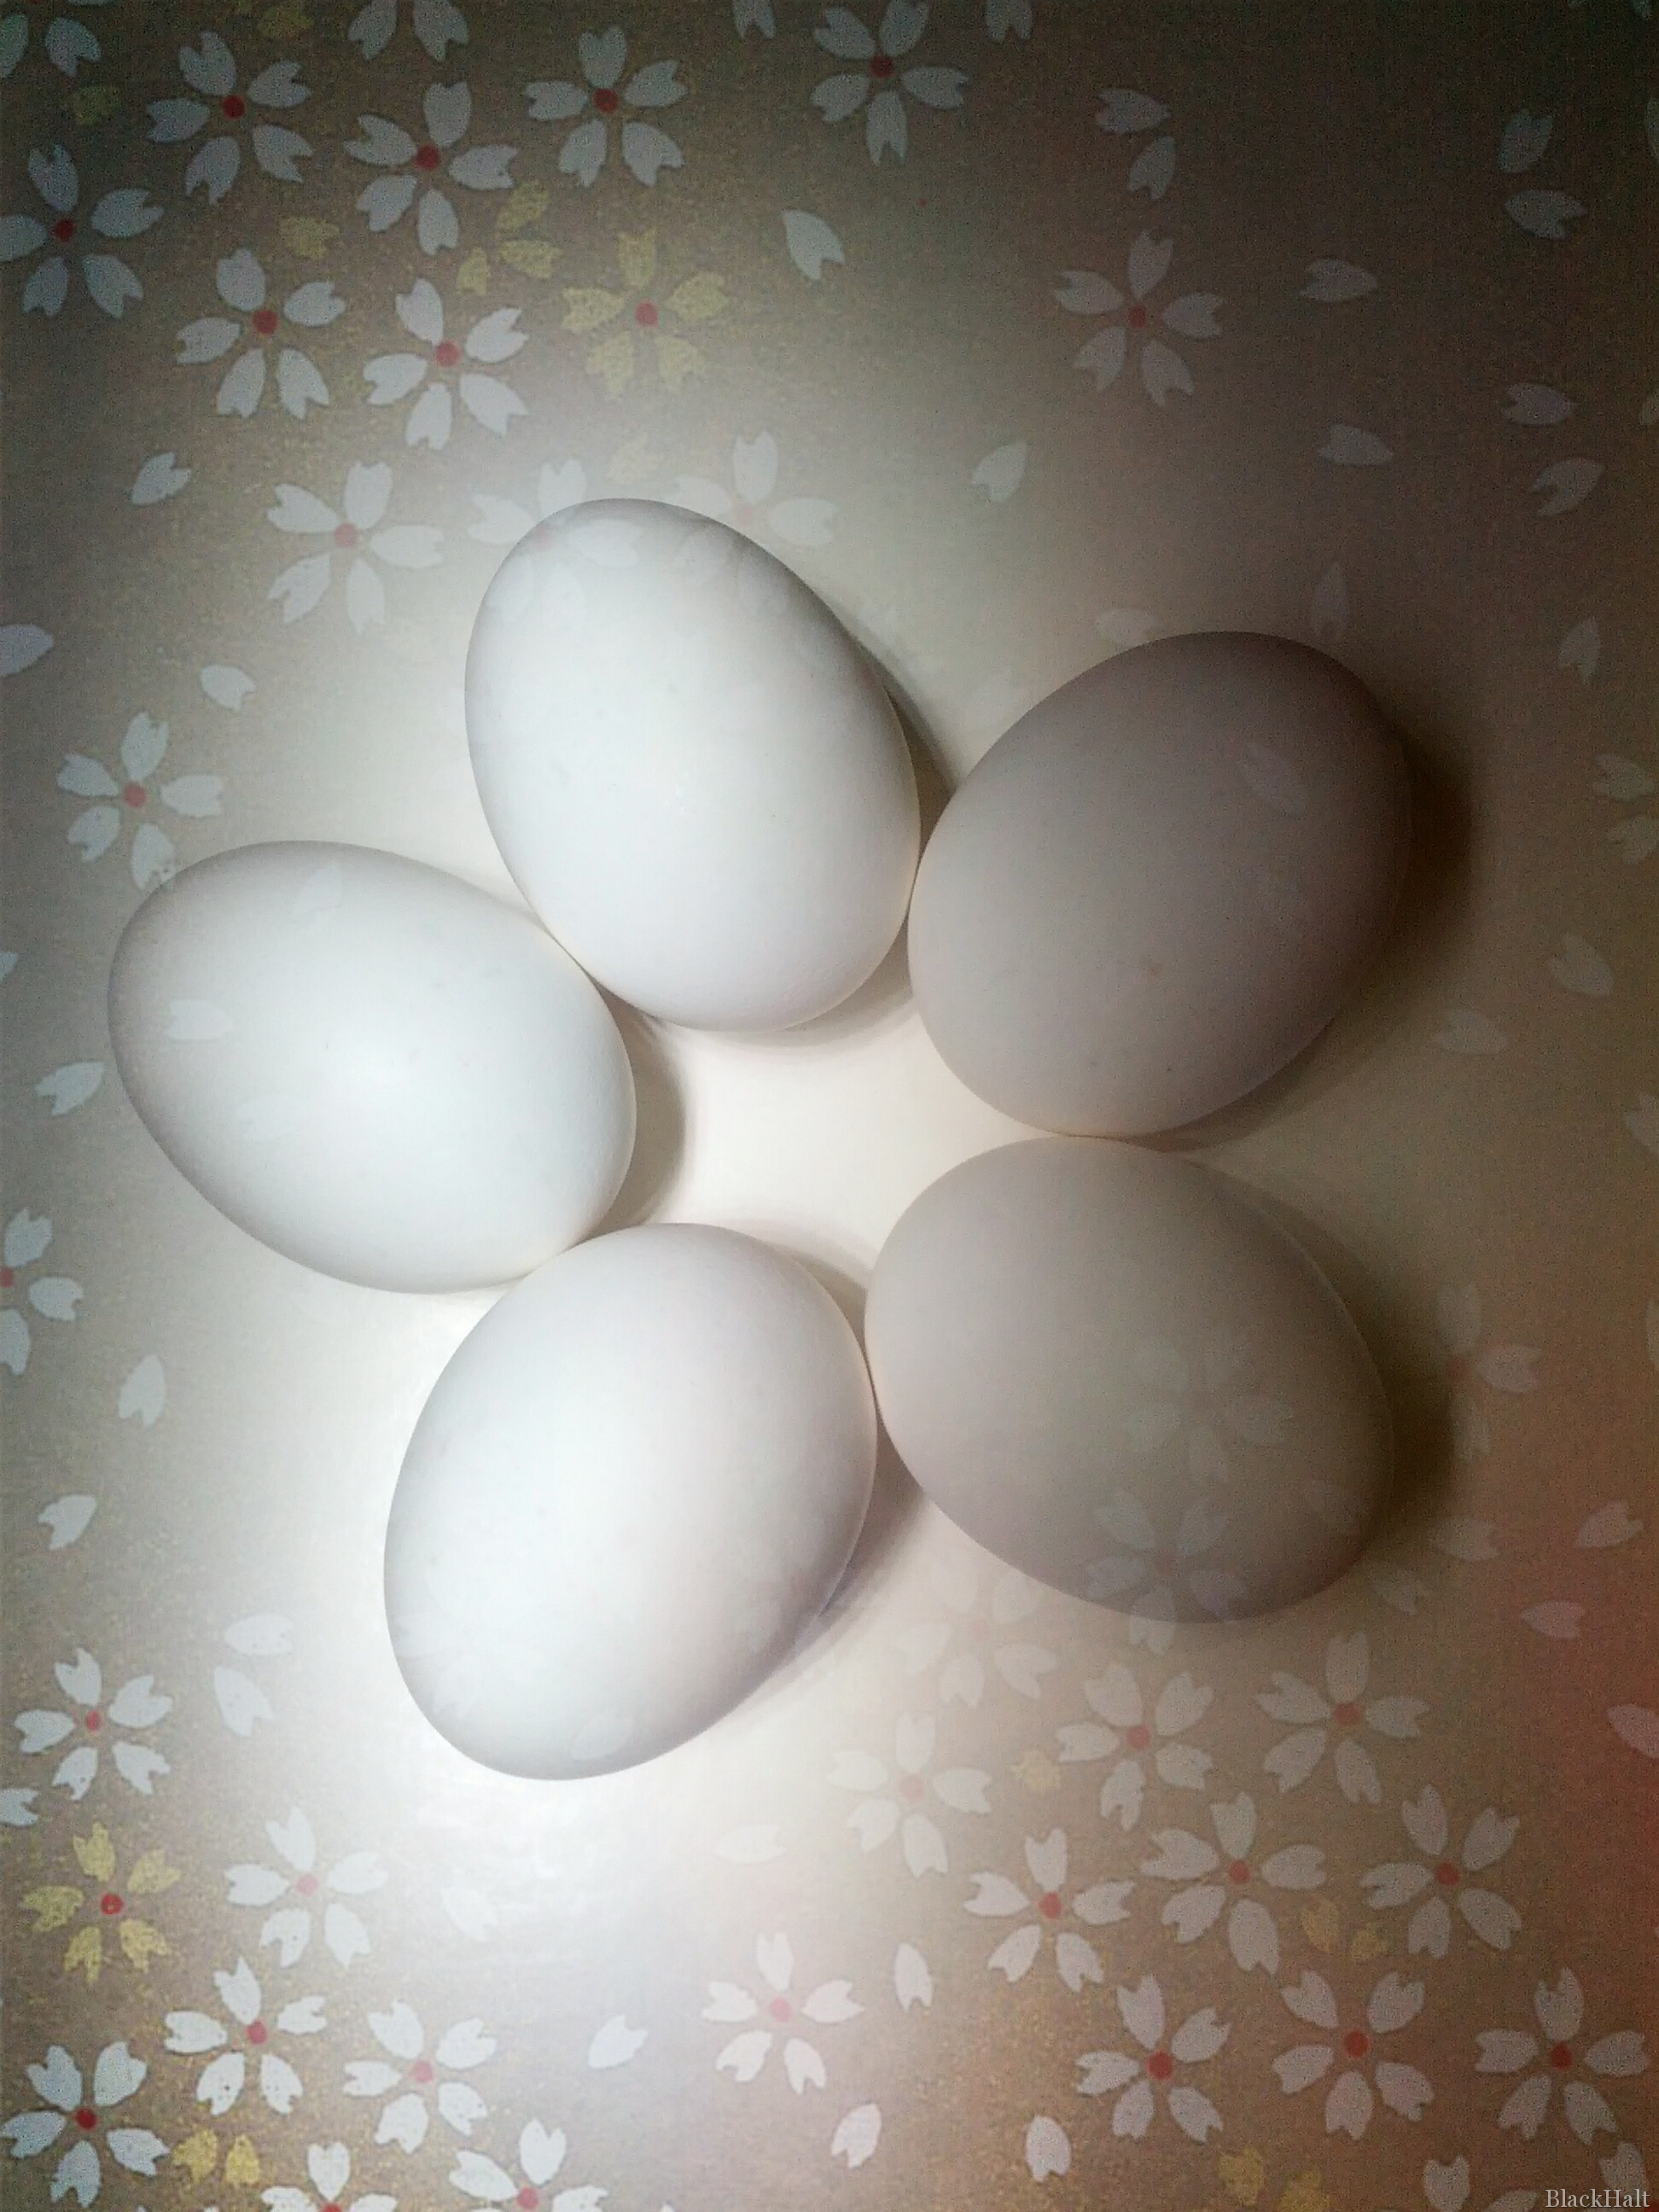 Lieldienu olas Nr.14